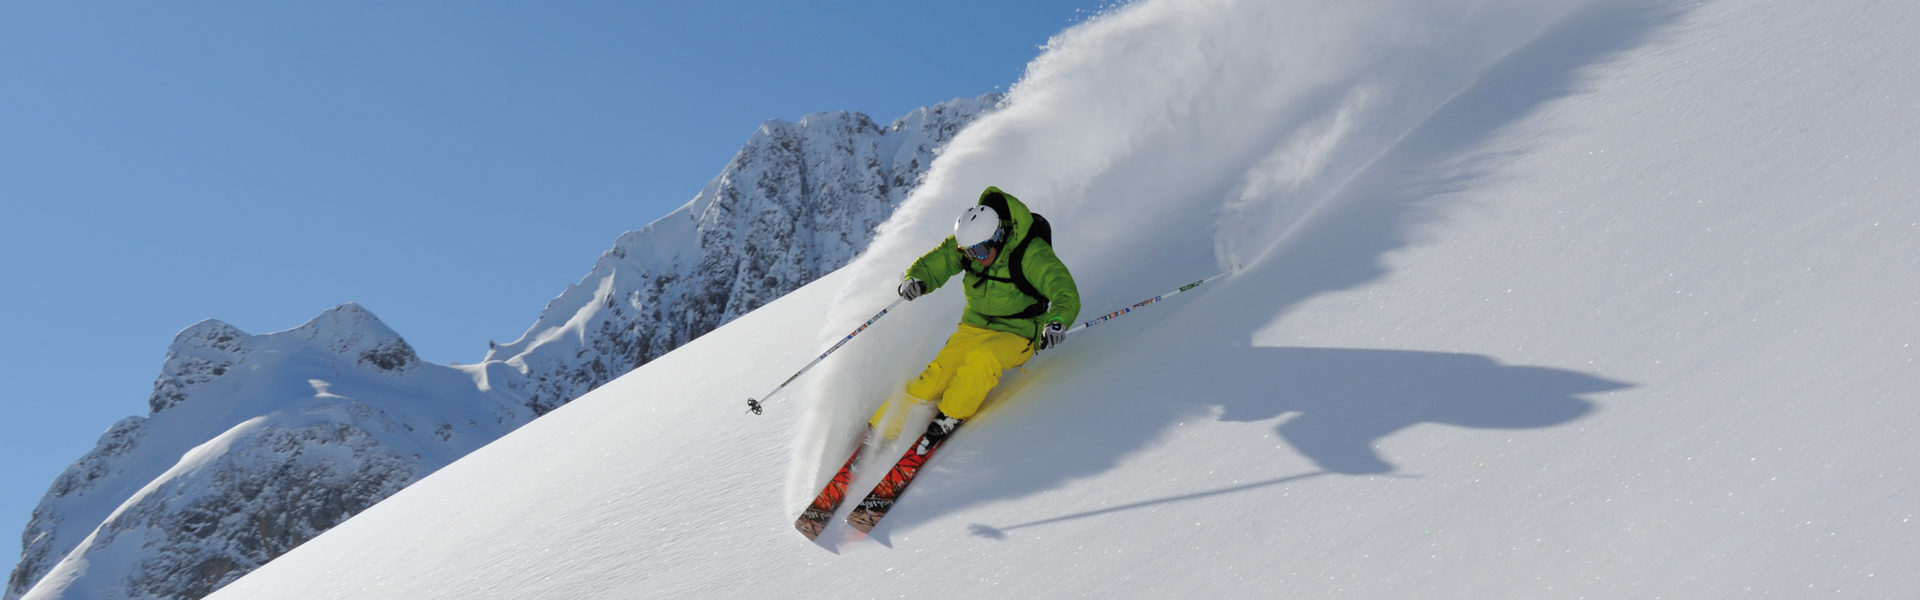 Freerider Arlberg (c) Sepp Mallaun/Vorarlberg Tourismus